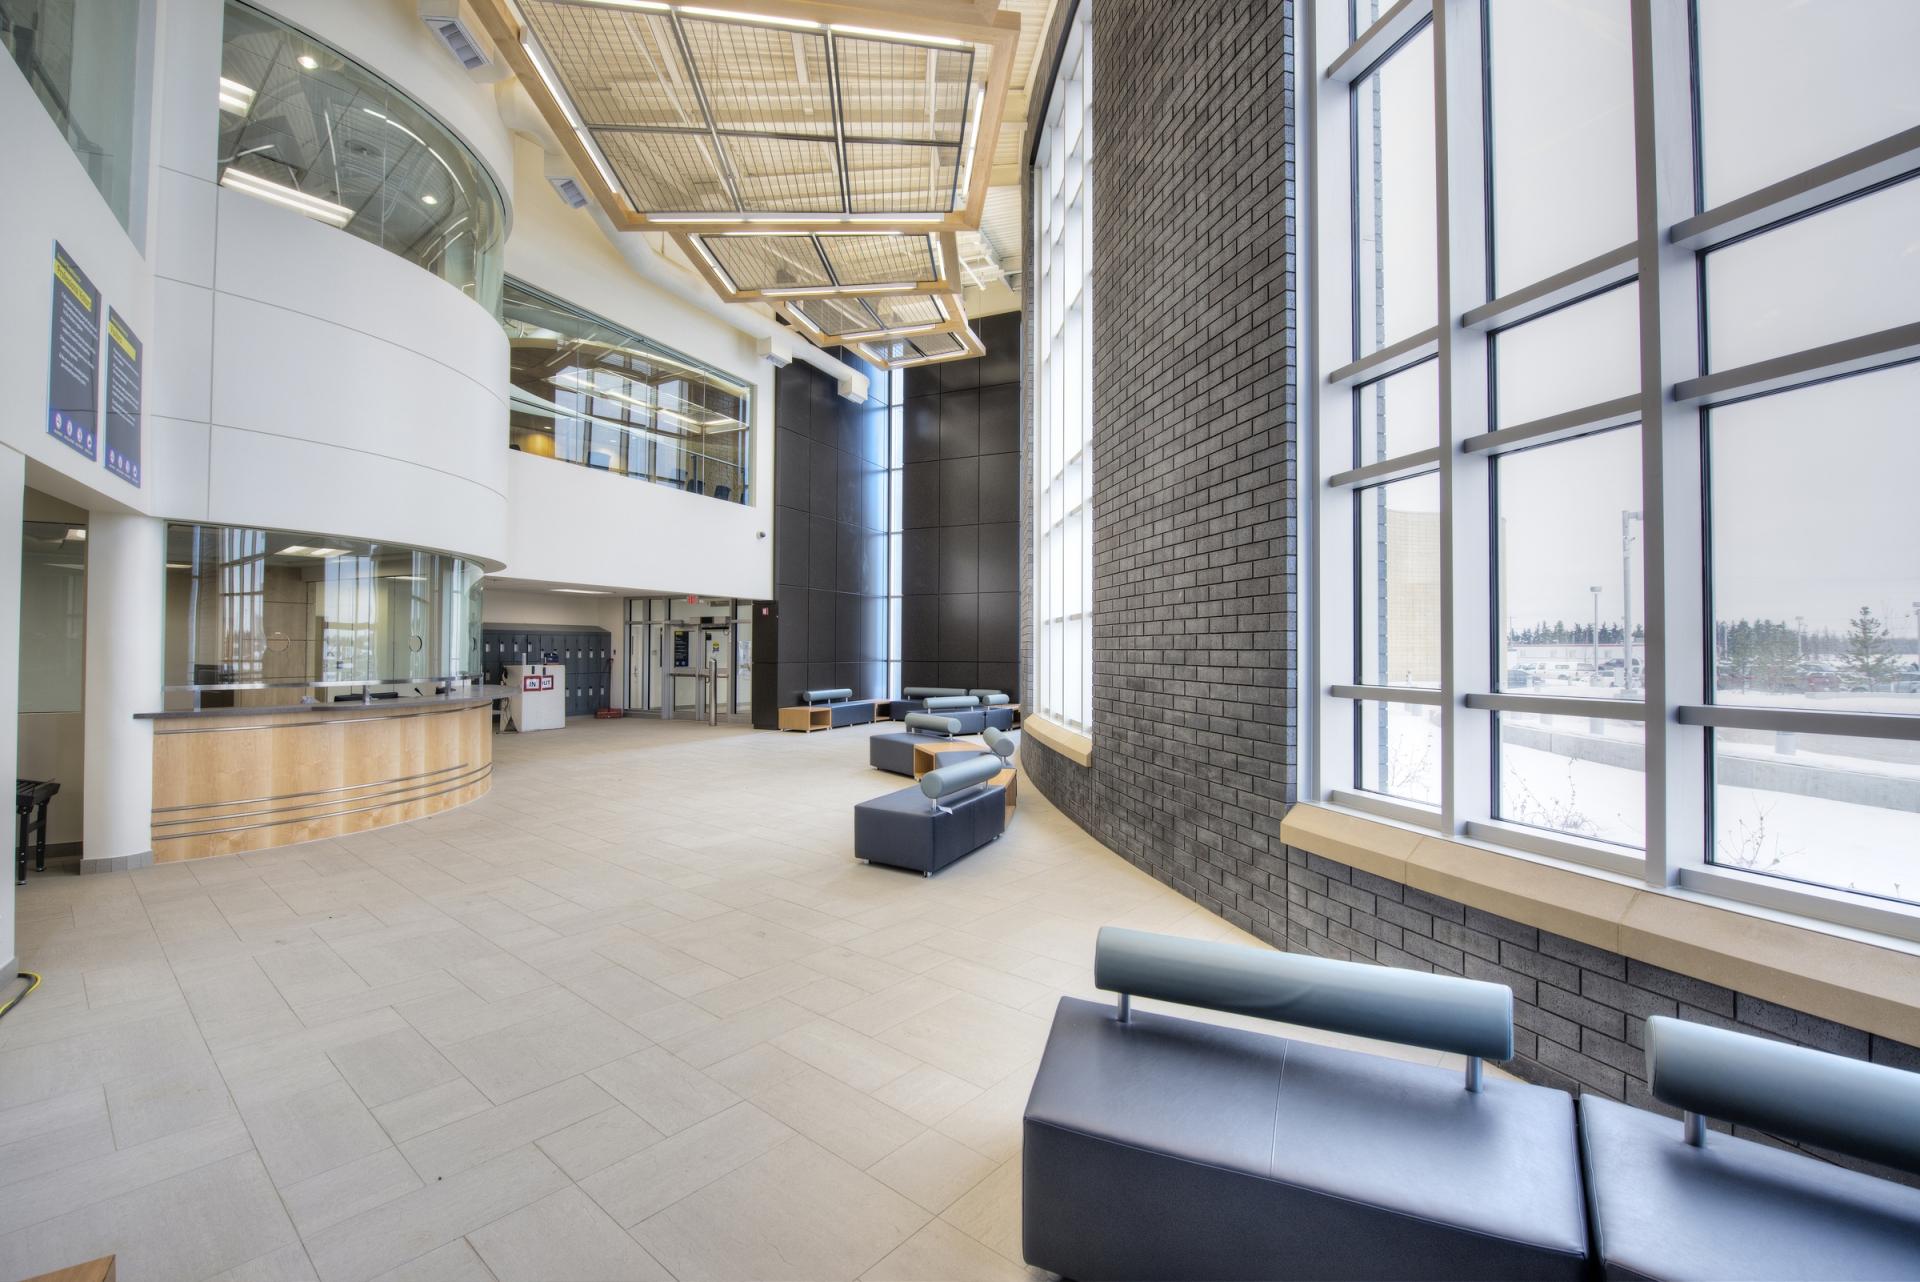 20130313 - SODCL Edmonton Remand Centre. Photos by Jimmy Jeong